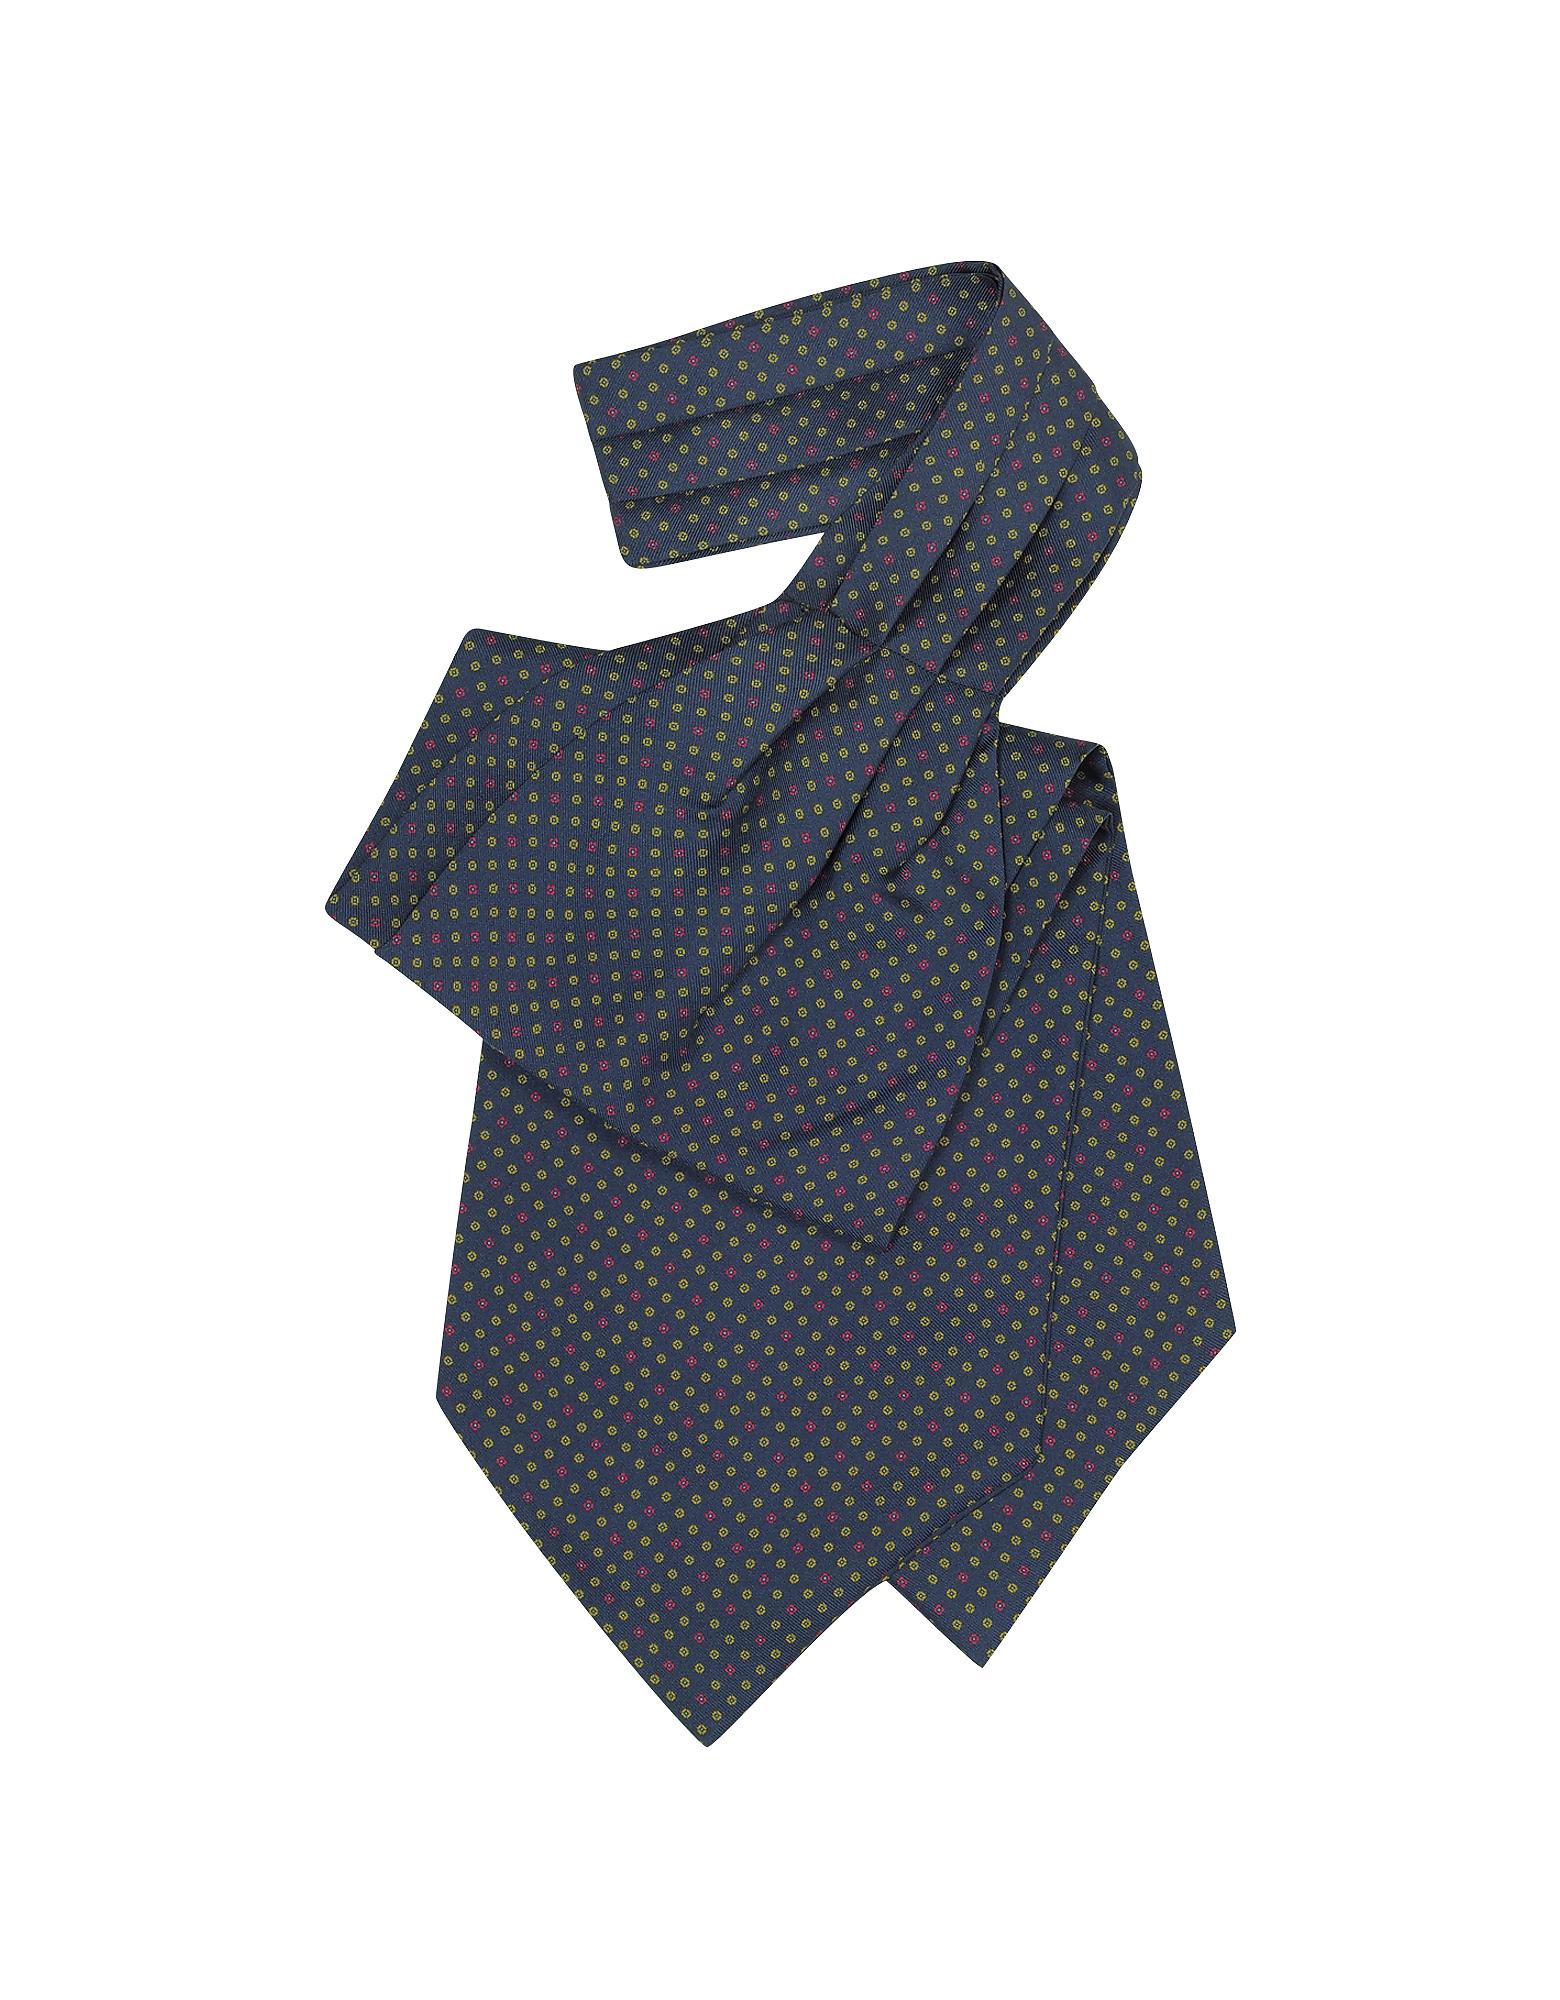 Image of Forzieri Designer Ascot ties, Mini Daisy Print Silk Ascot